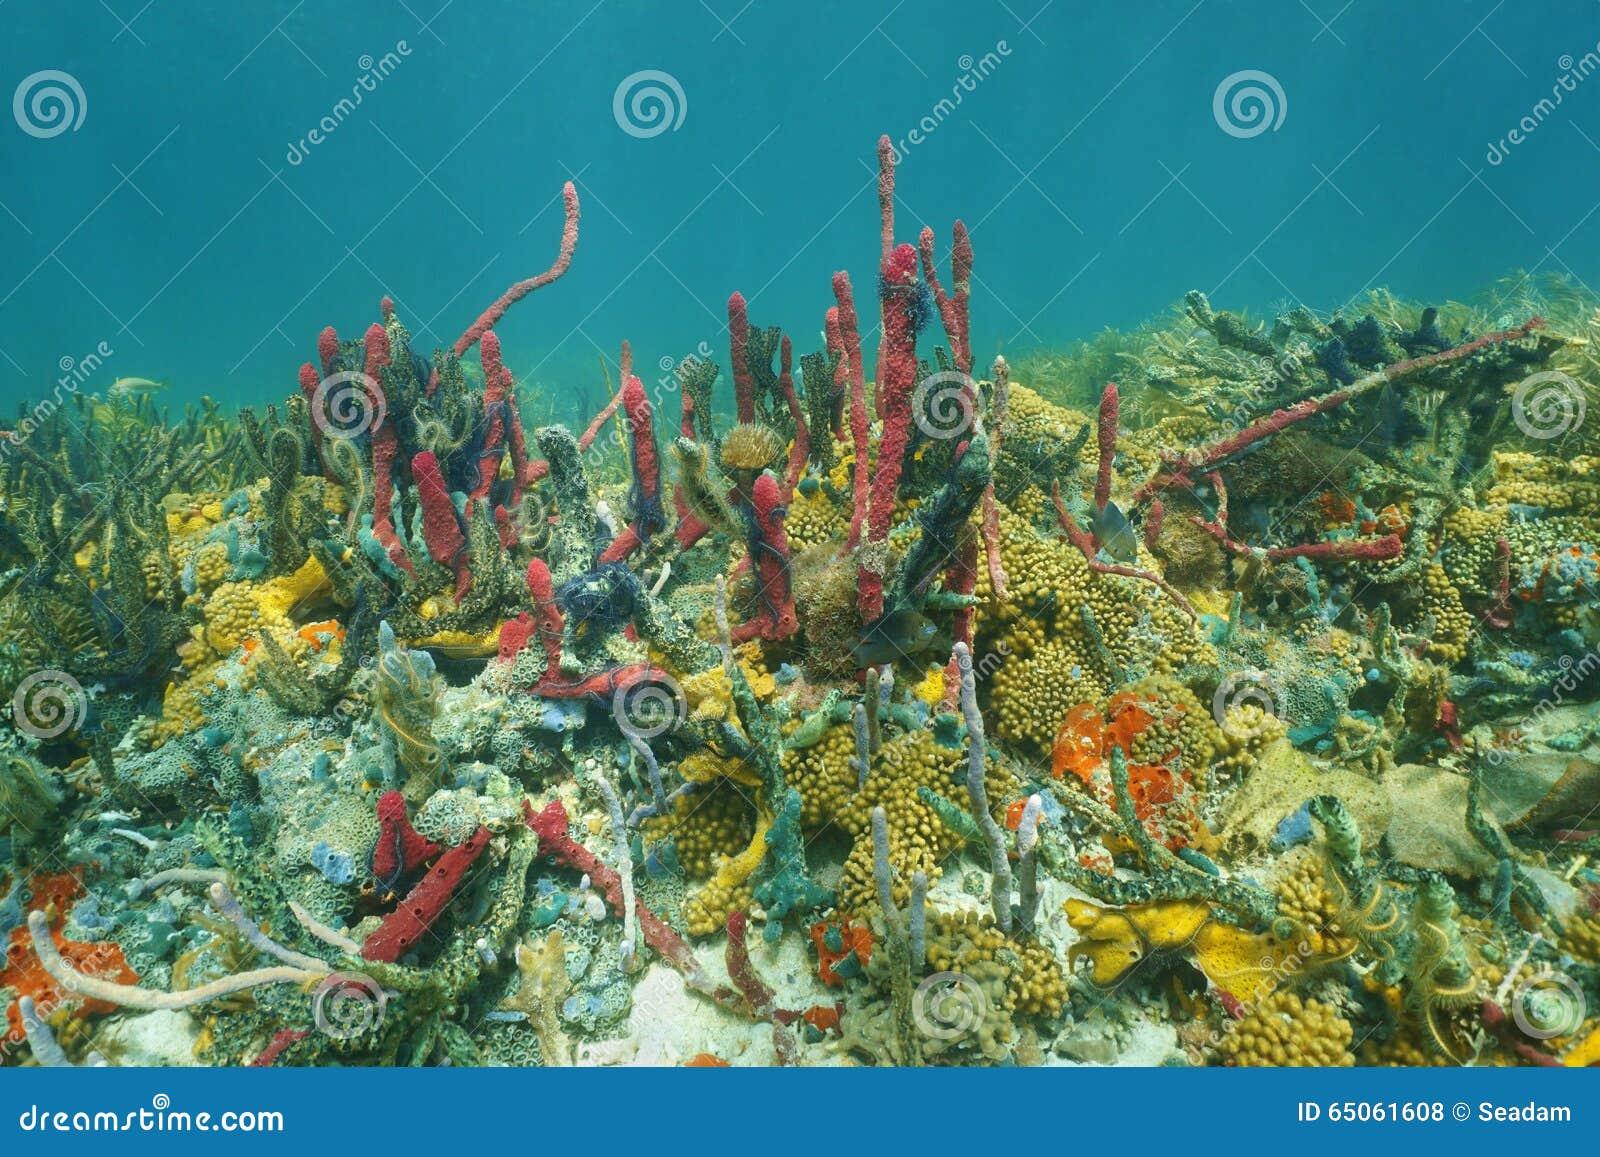 Underwater Sea-life Stock Images - Image: 30137924 |Ocean Life Plant Caribbean